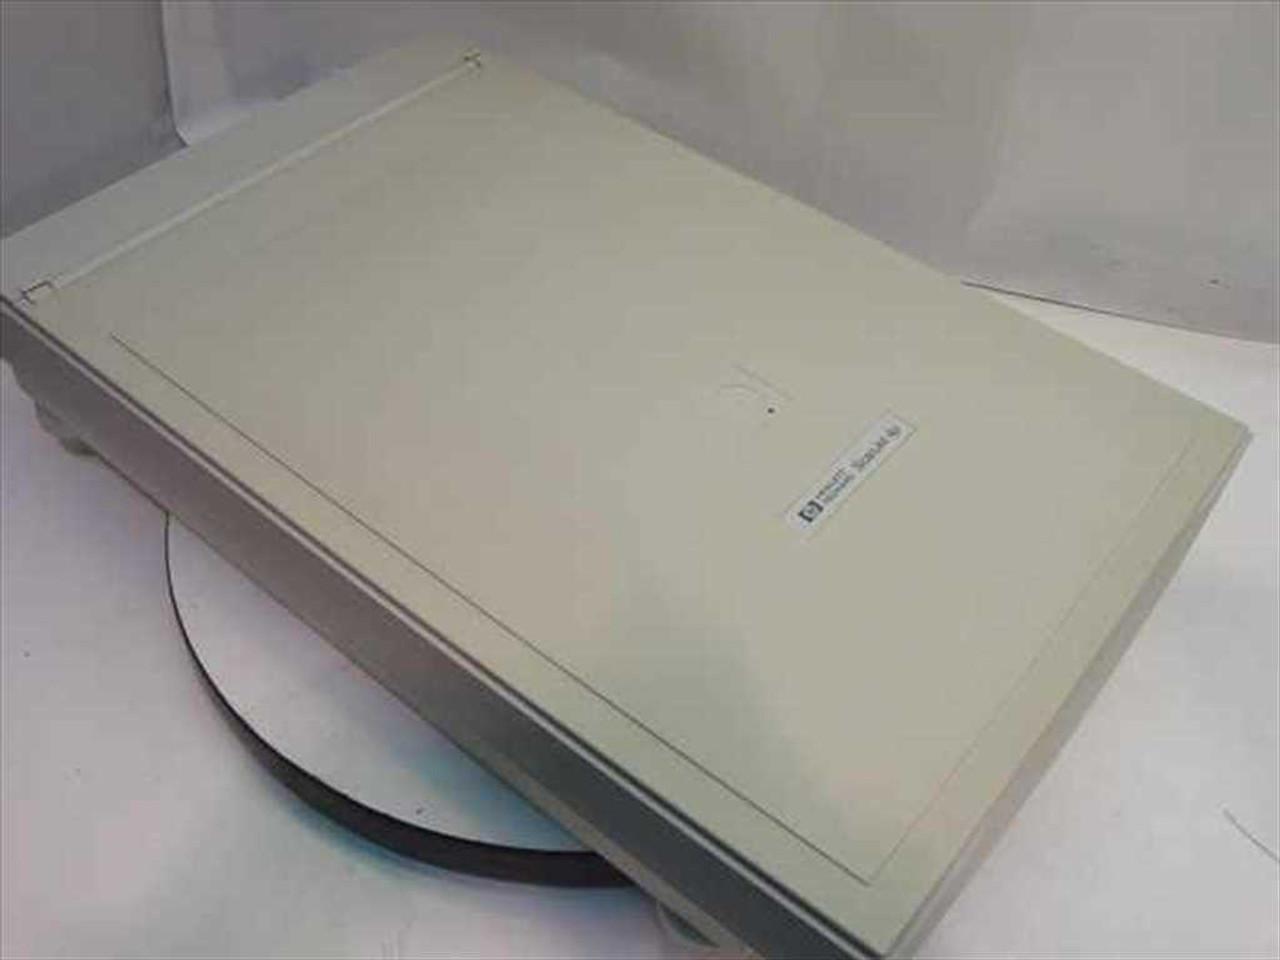 HP SCANJET 4P C1130A TREIBER WINDOWS XP